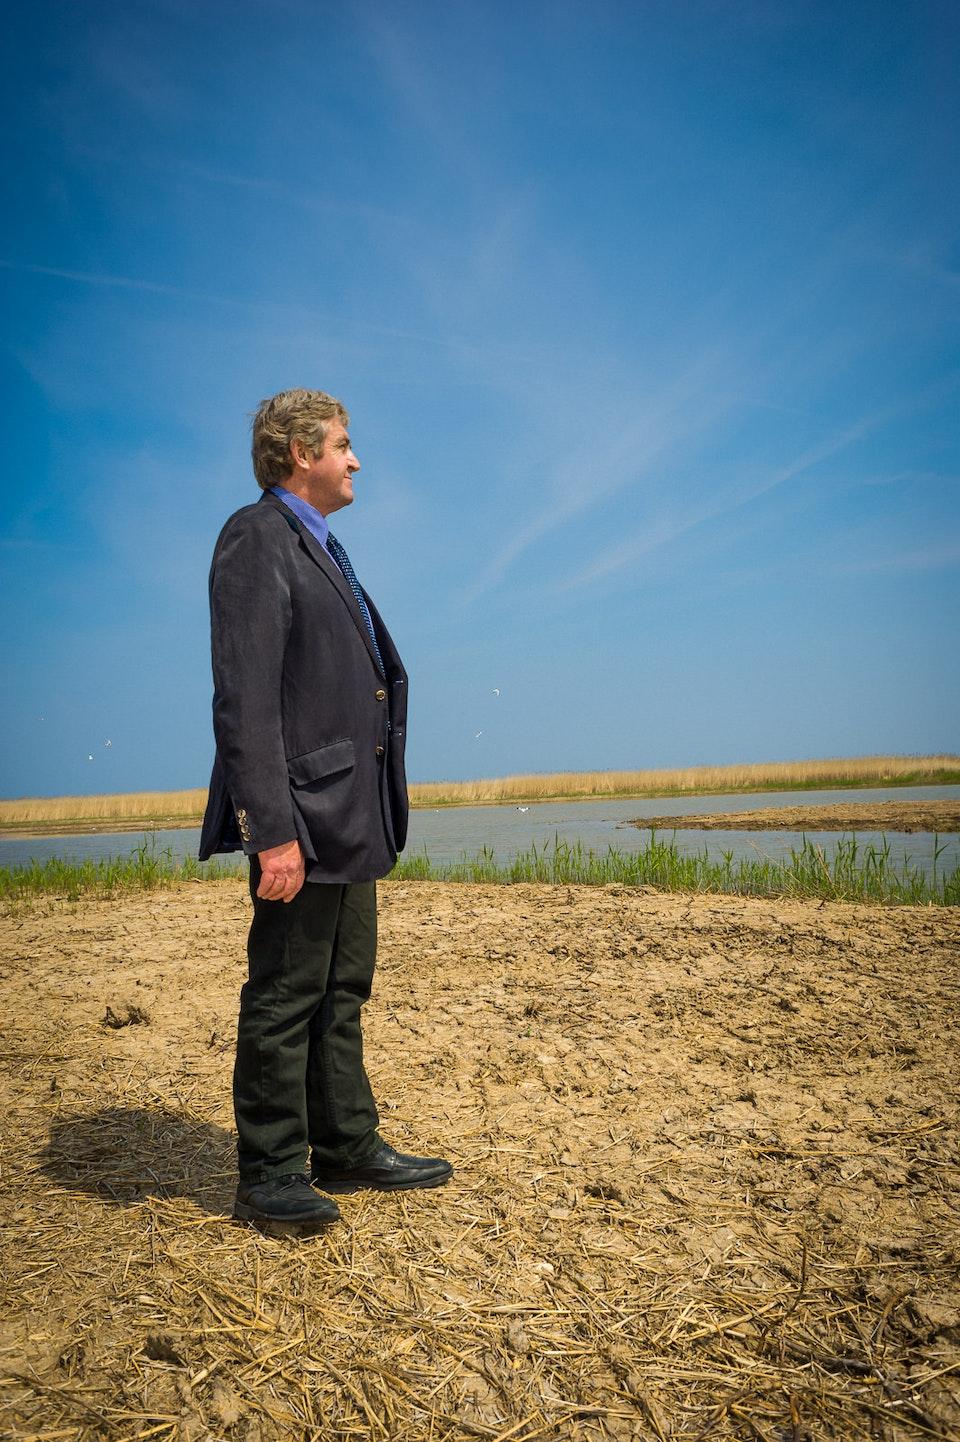 Portraits - Brendan Joyce OBE, Norfolk Wild Life Trust Director